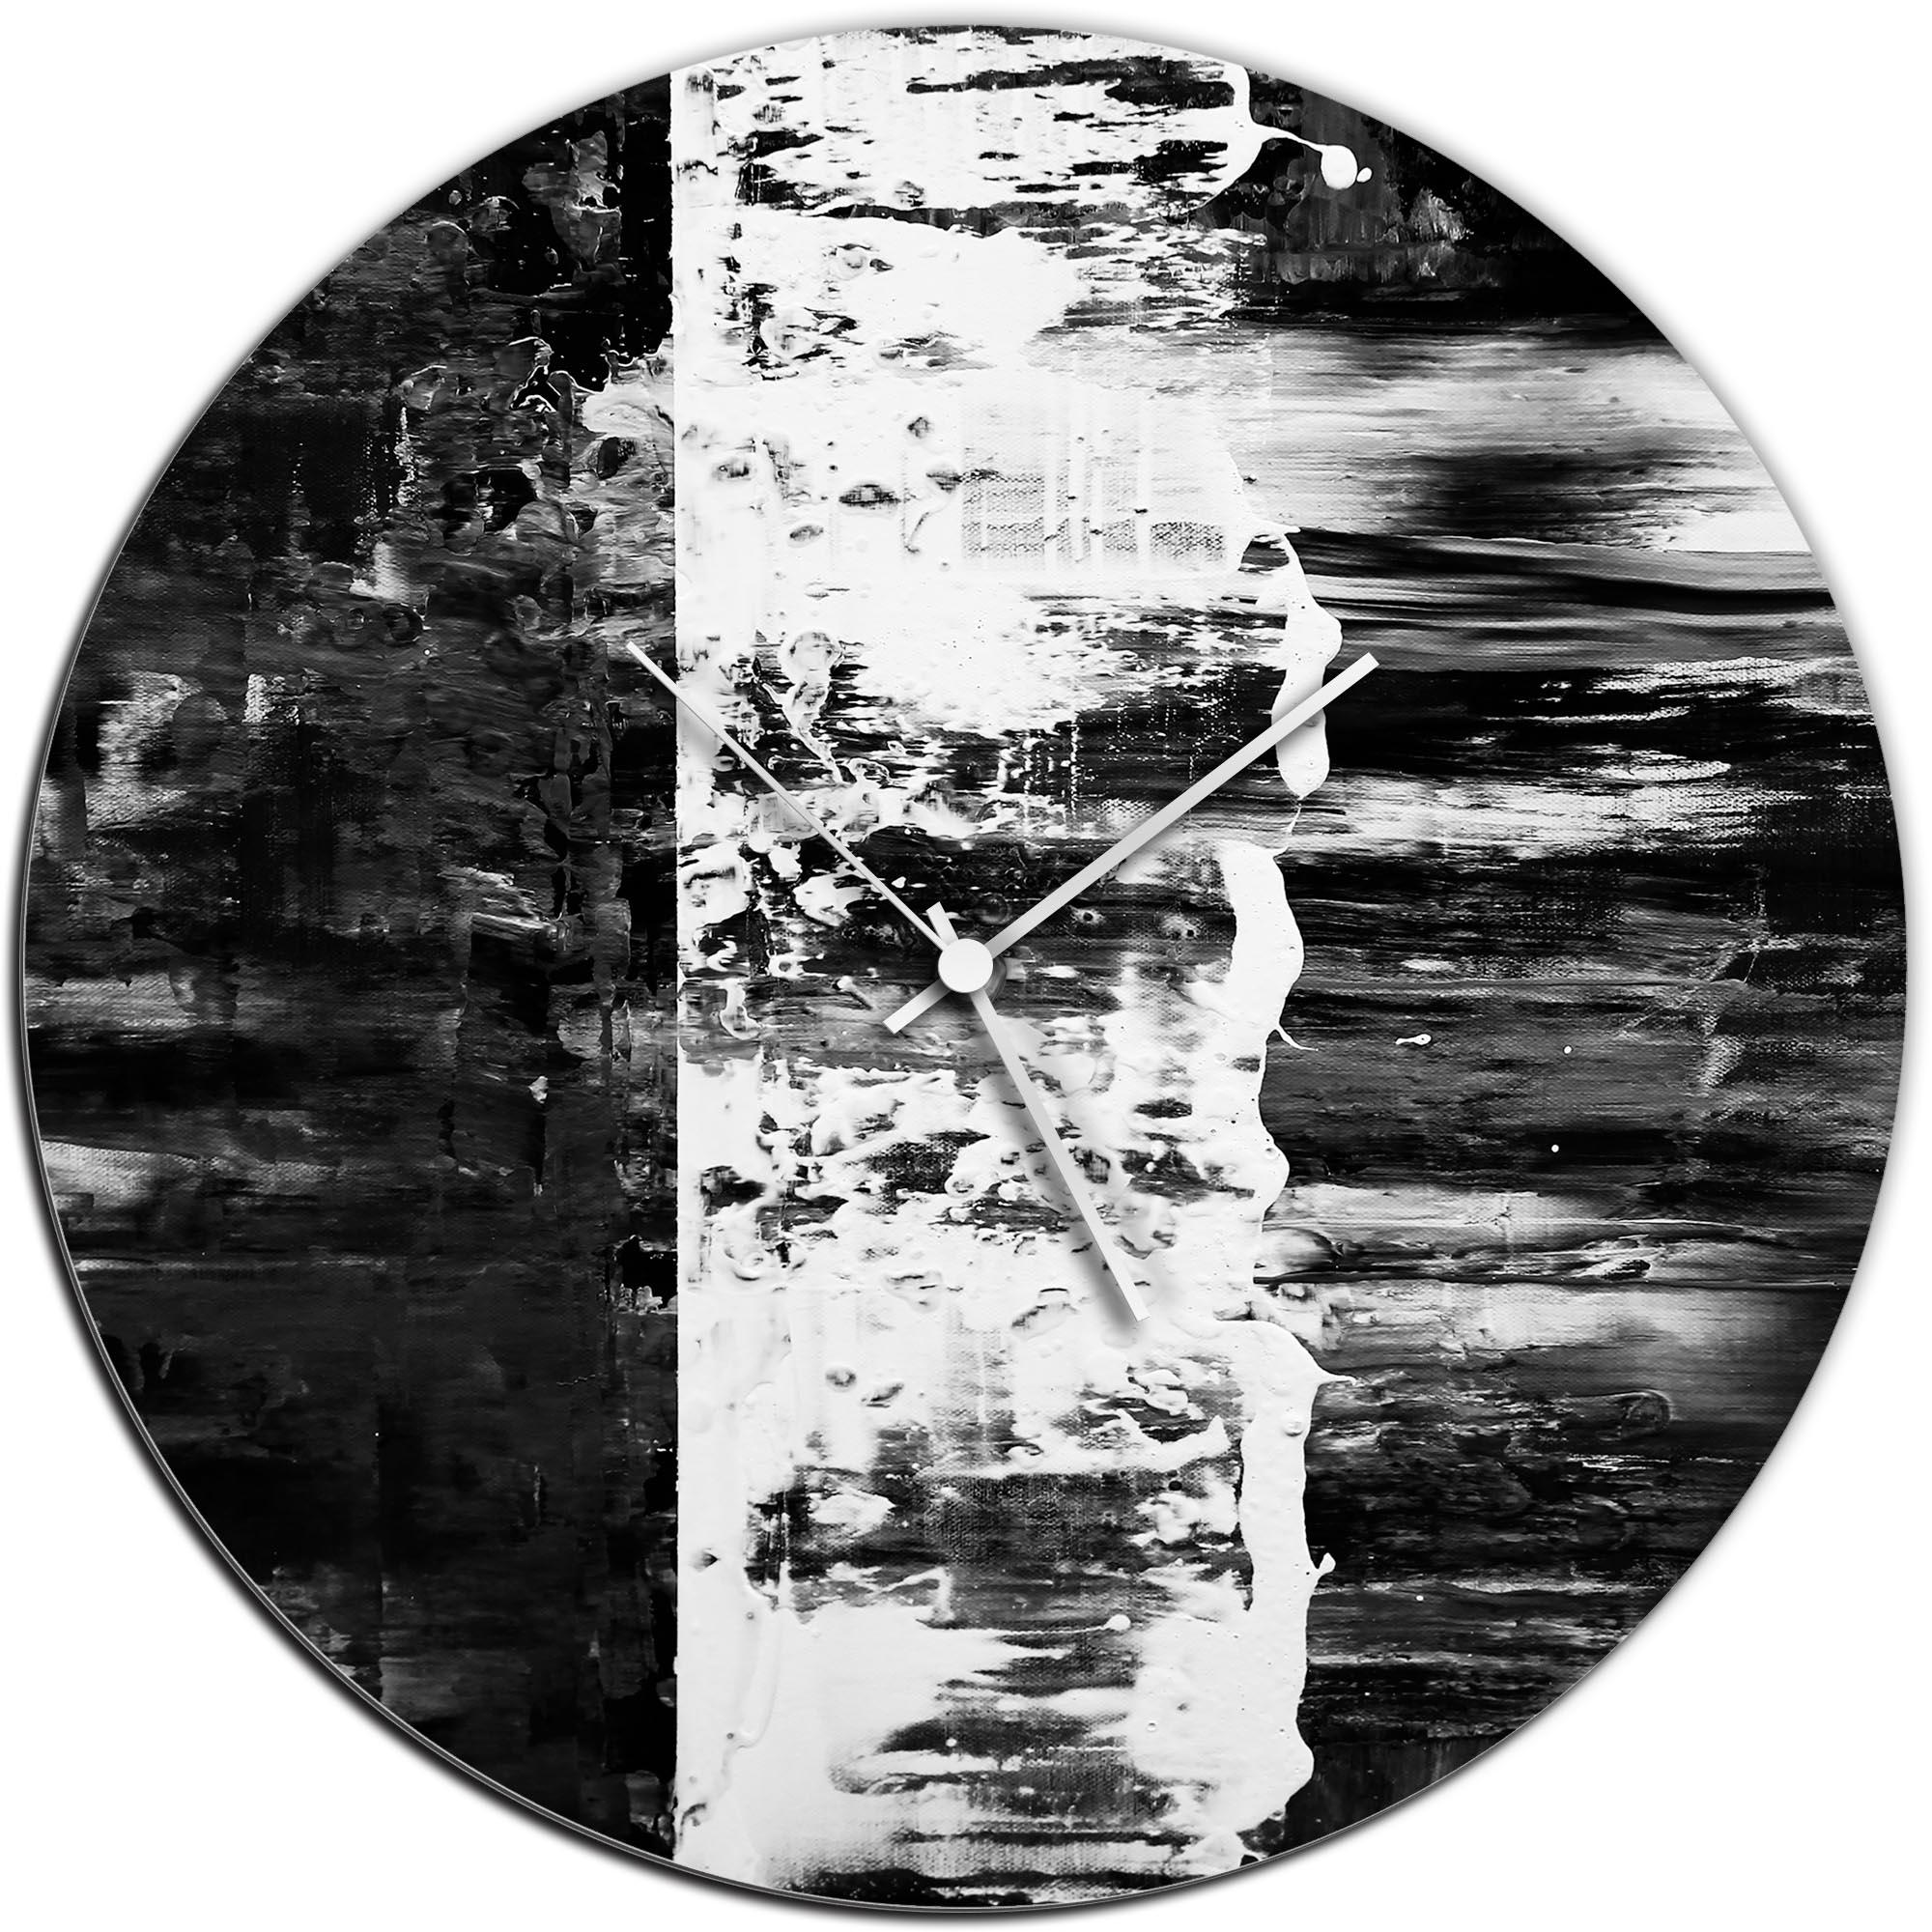 Mendo Vasilevski 'Black Street Circle Clock' 16in x 16in Modern Wall Clock on Aluminum Composite